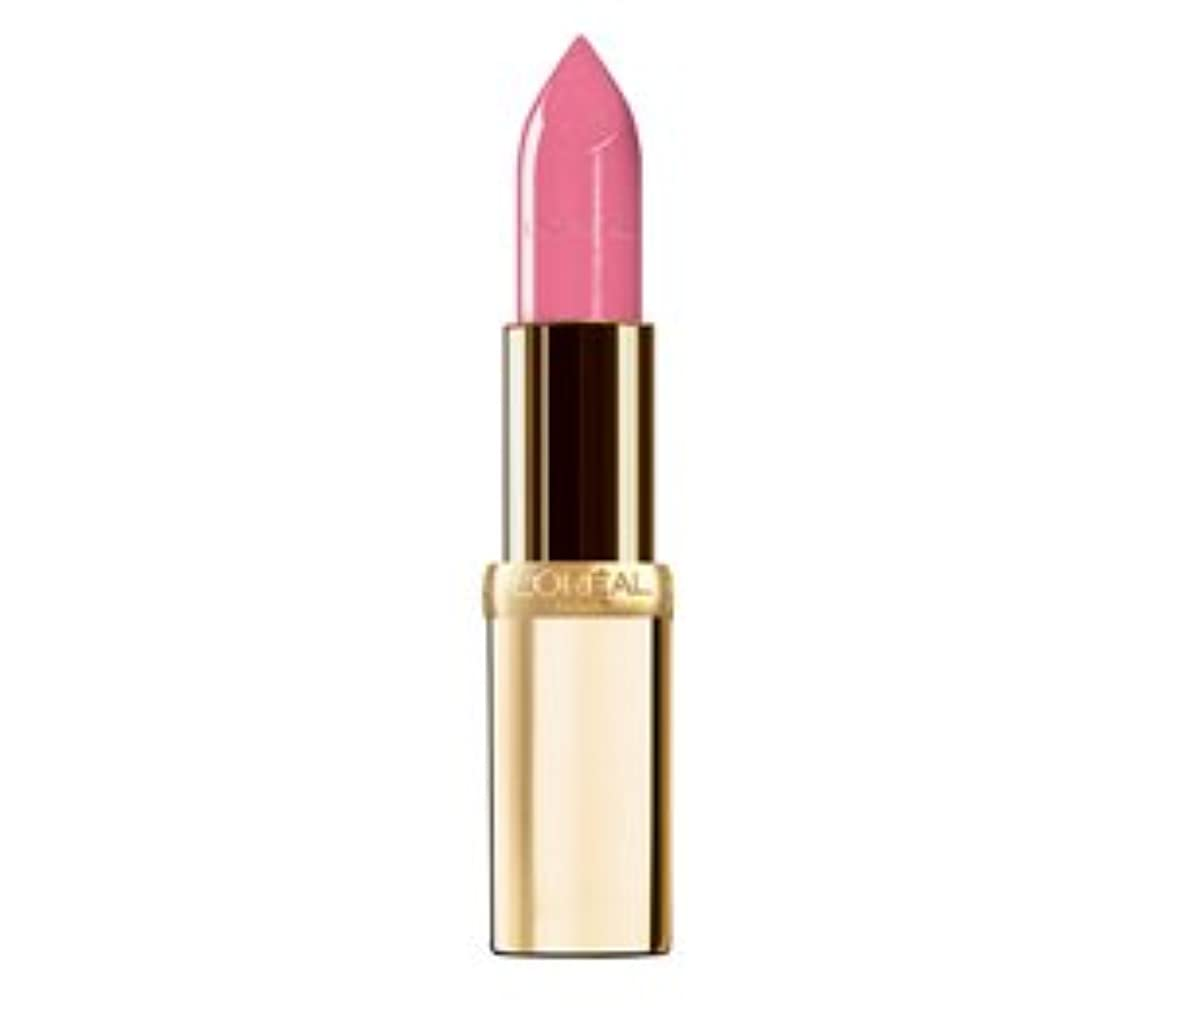 即席原因自宅でLoreal Paris Color Riche Nr. 285 Pink Fever Farbe: Rosa Lippenstift für strahlend schöne Lippen ideal für Blondes...